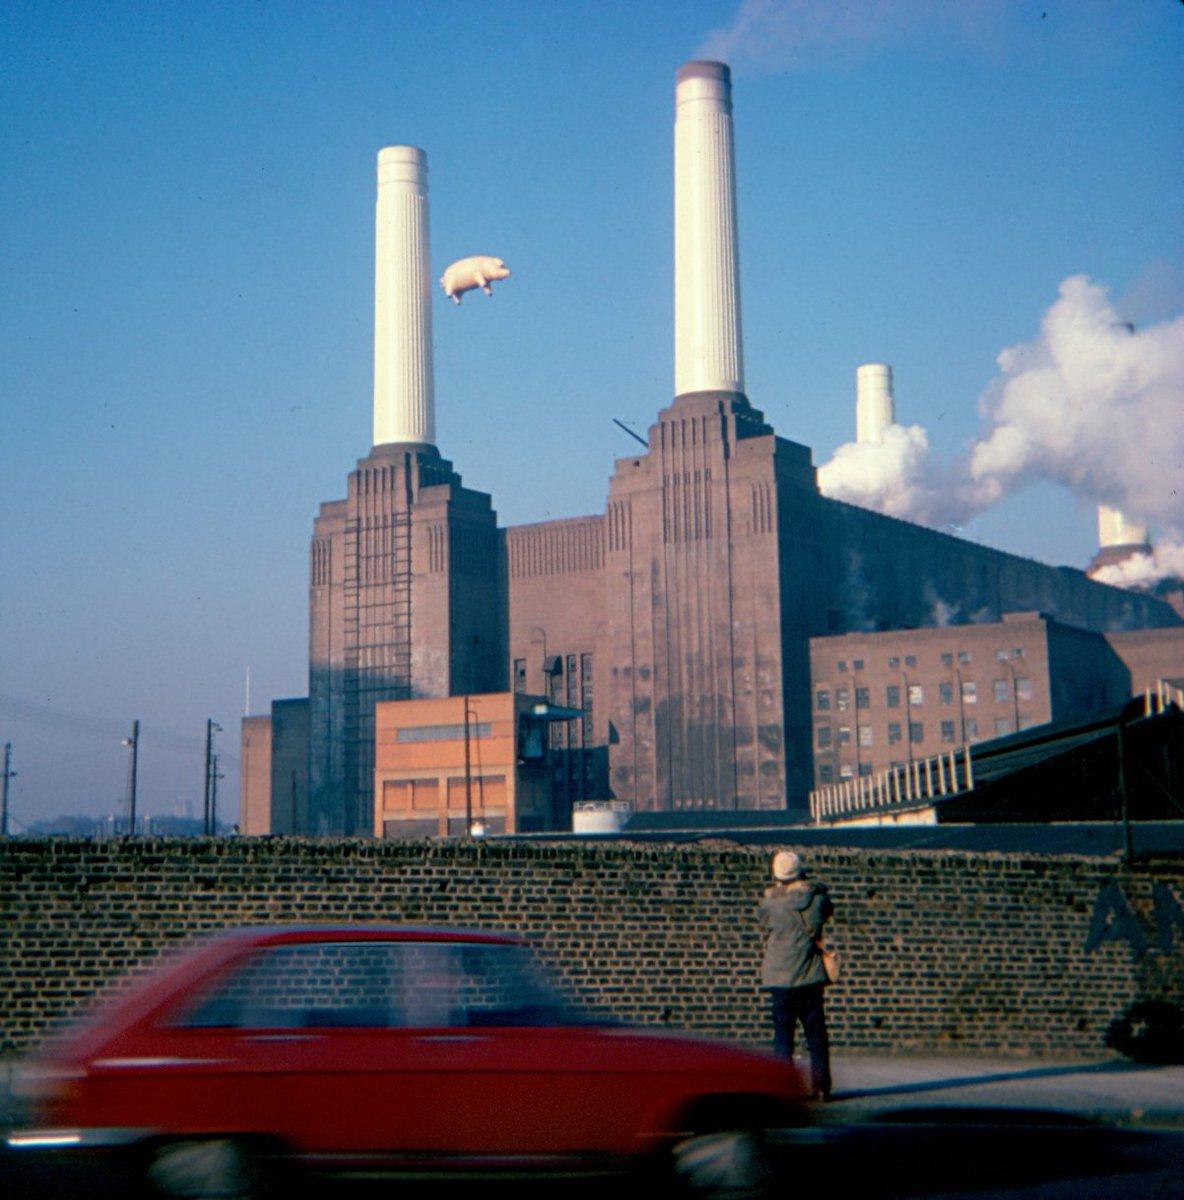 DstxnxiWoAIPzsL?format=jpg&name=medium - Pink Floyd's new 'Animals' takes in a railway!